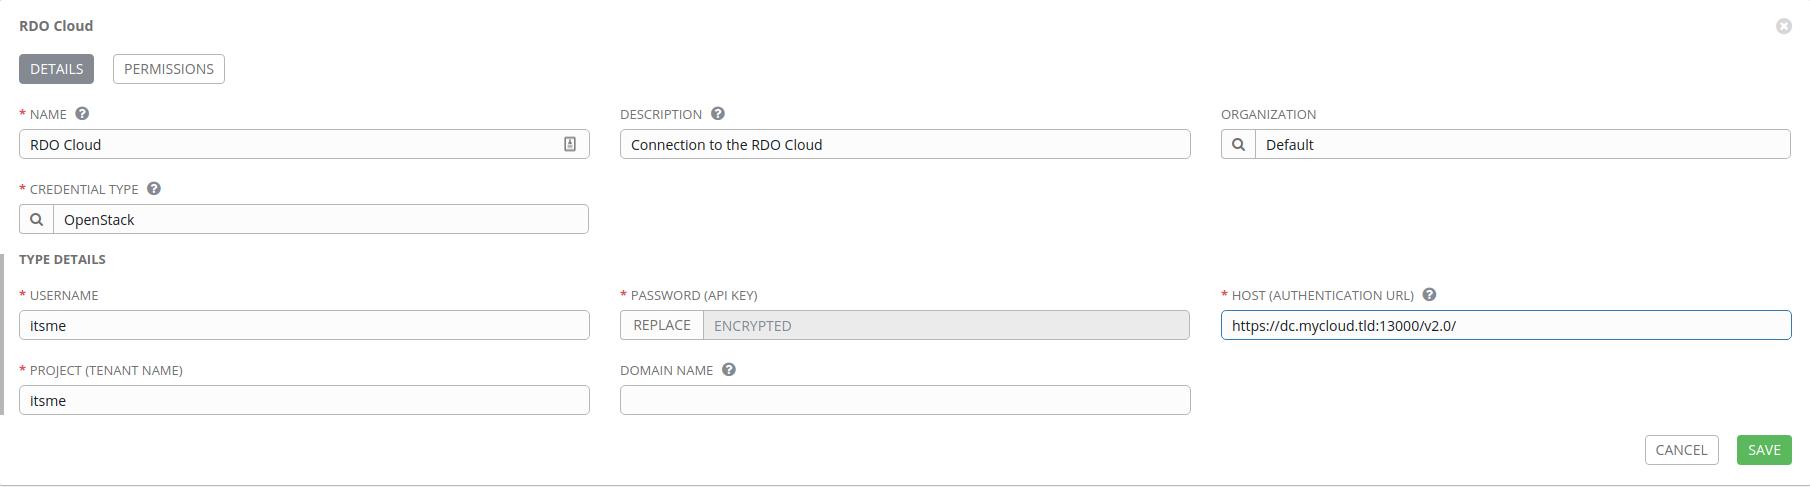 RDO Cloud credential configuration